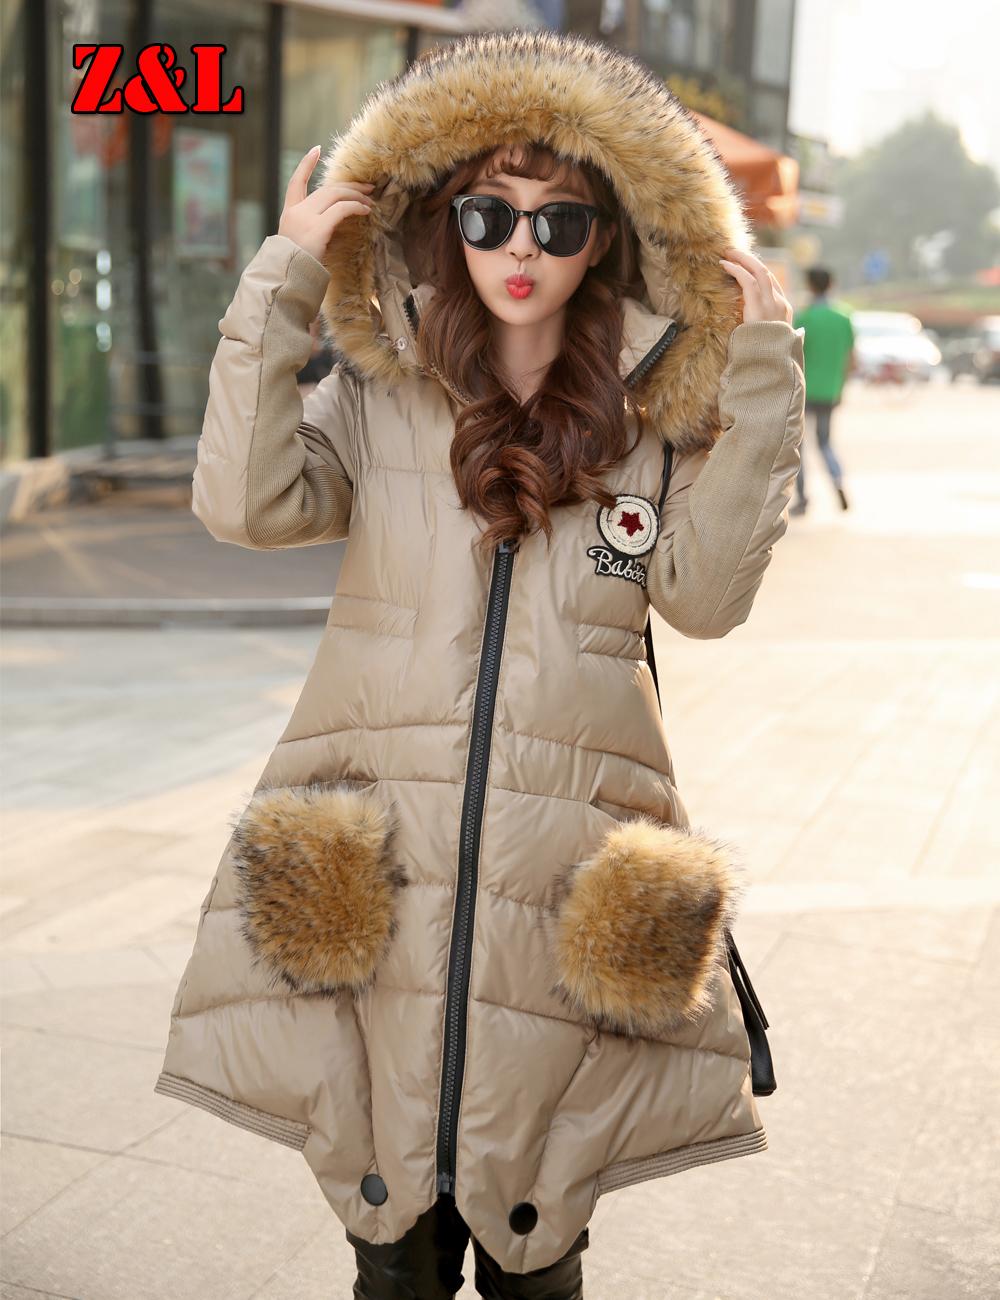 Maternity 2013 new winter coat Korean pregnant women coat jacket stitching<br><br>Aliexpress